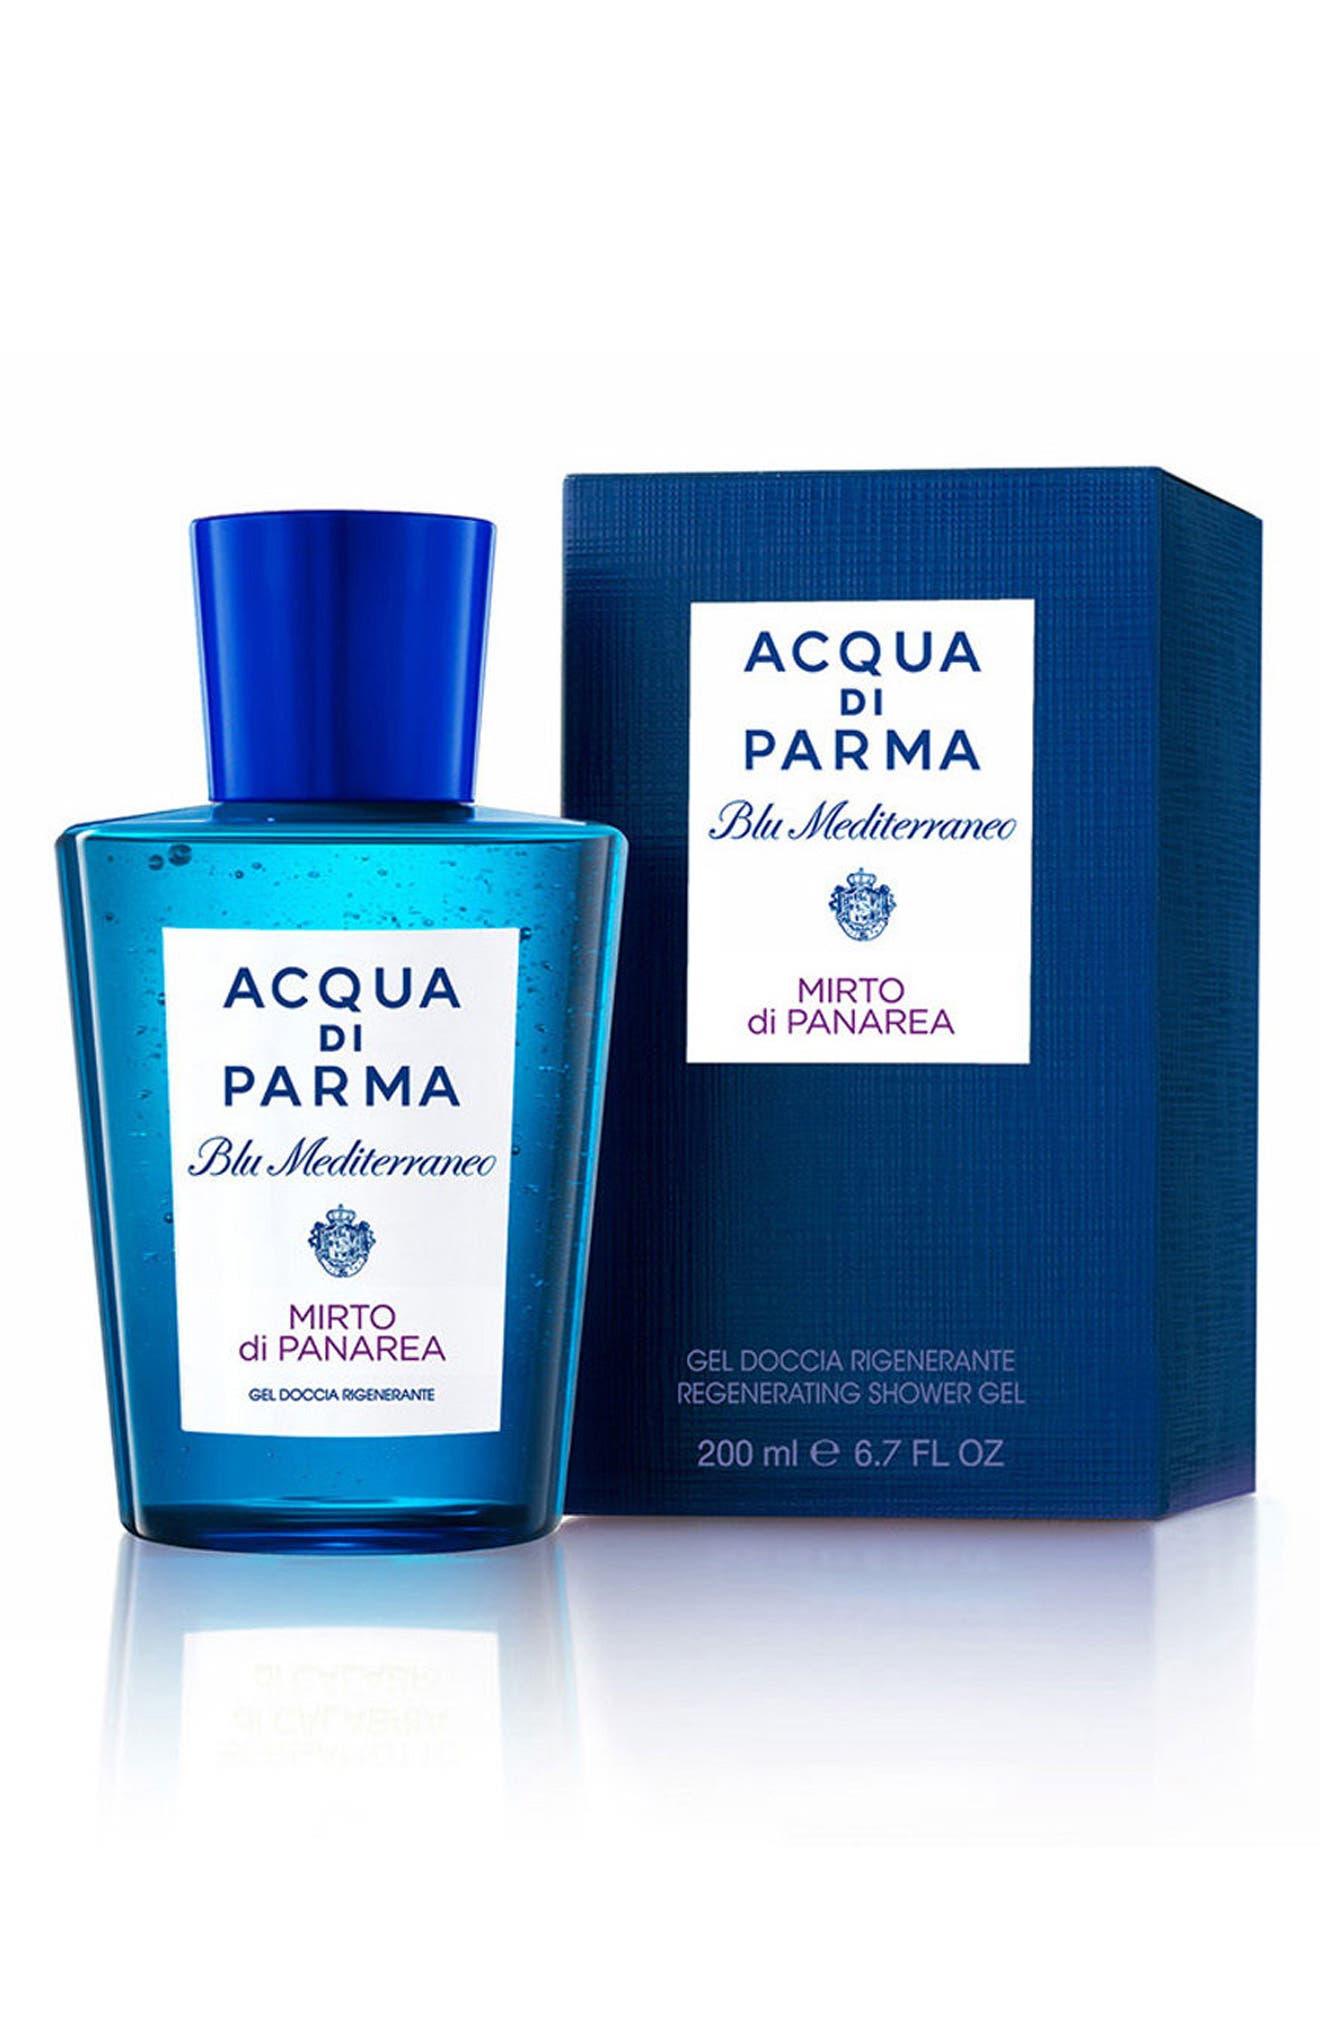 Alternate Image 2  - Acqua di Parma 'Blu Mediterraneo - Mirto di Panarea' Shower Gel